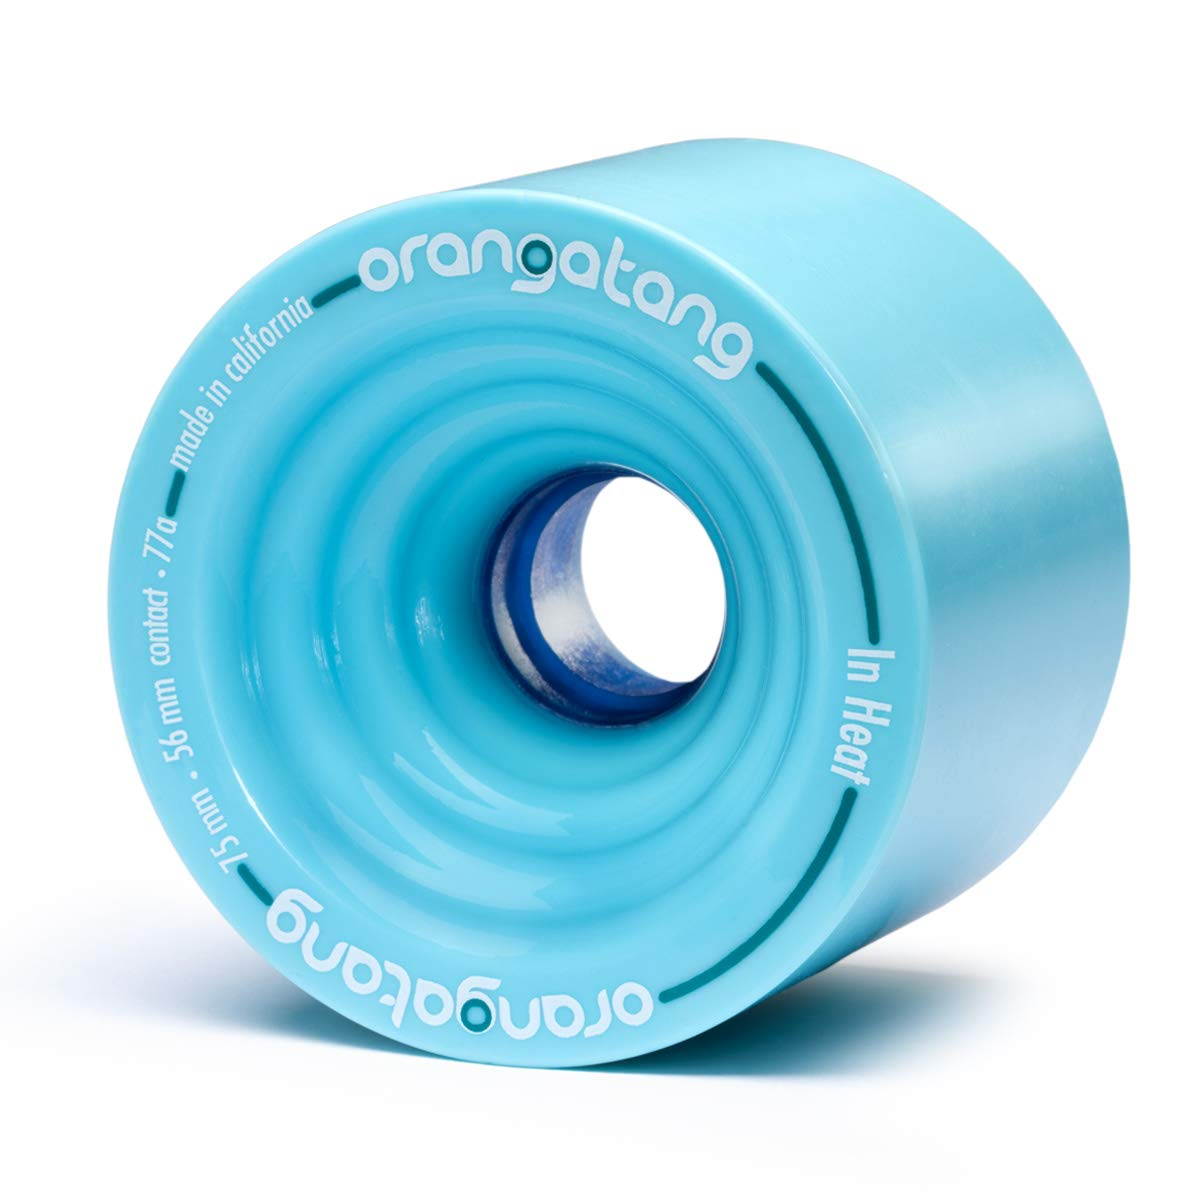 Orangatang in Heat 75 mm 77a Downhill Longboard Skateboard Cruising Wheels w/Loaded Jehu V2 Bearings (Blue, Set of 4) by Orangatang